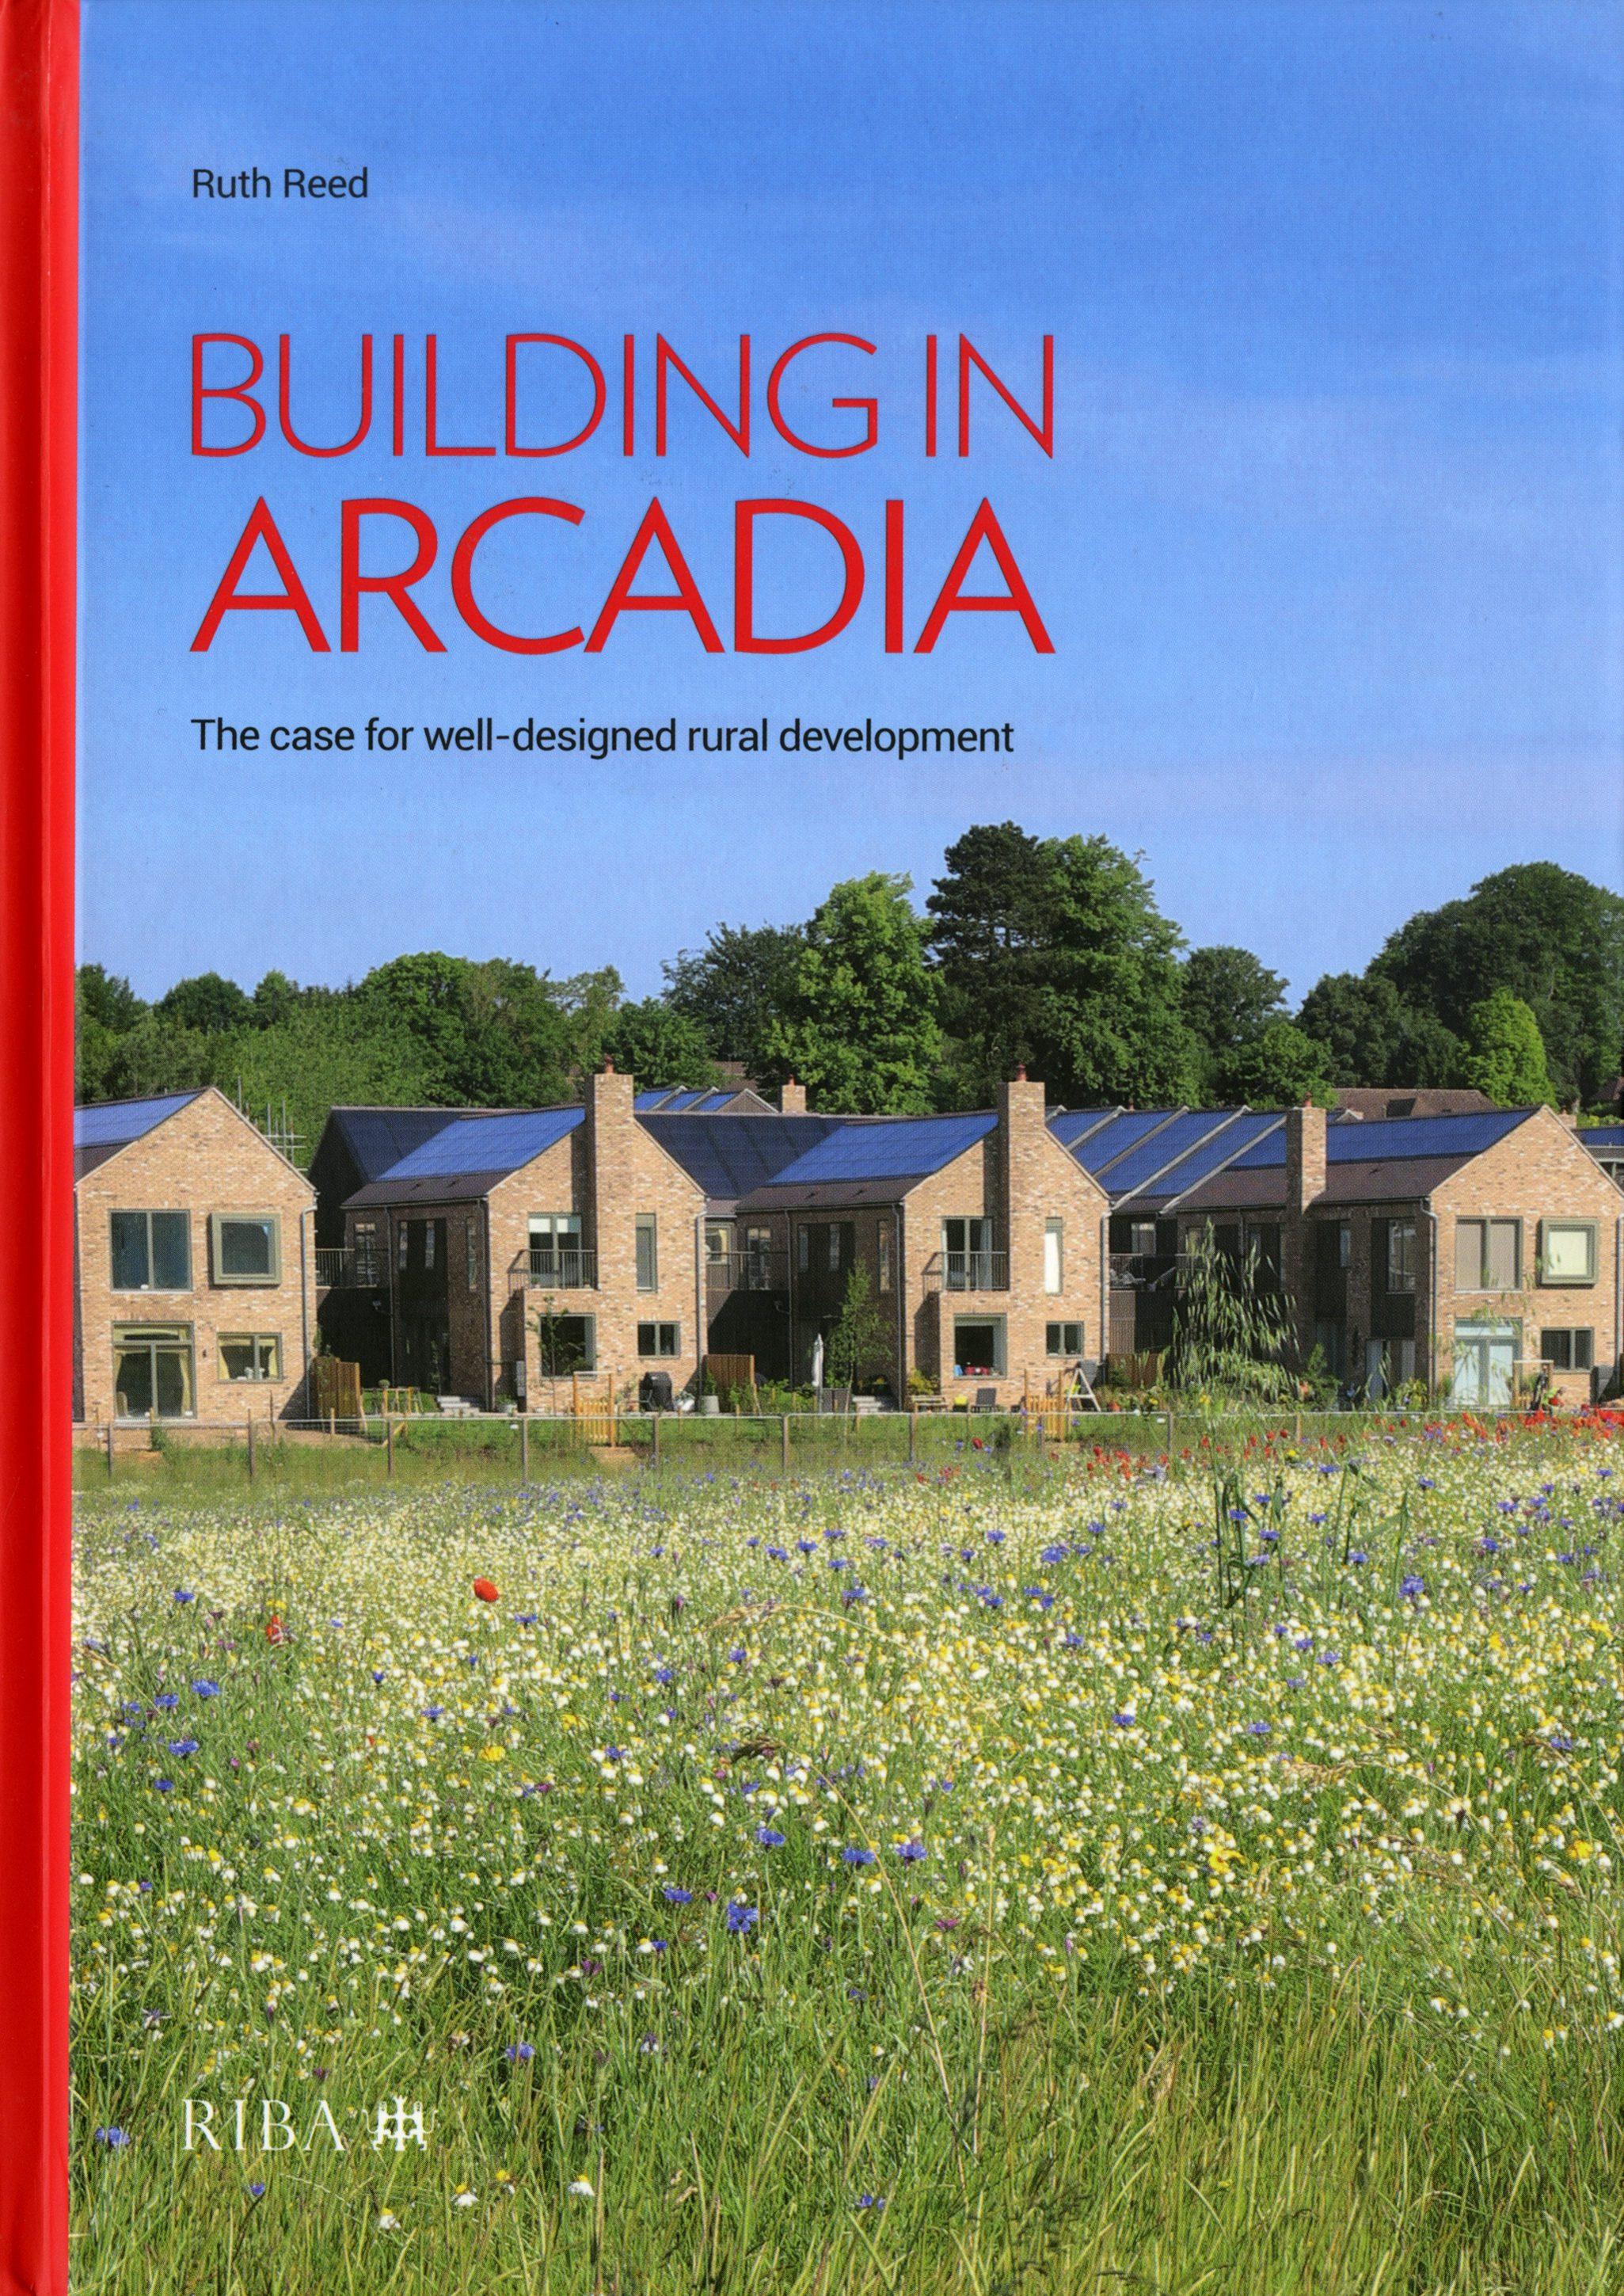 Building in Arcadia